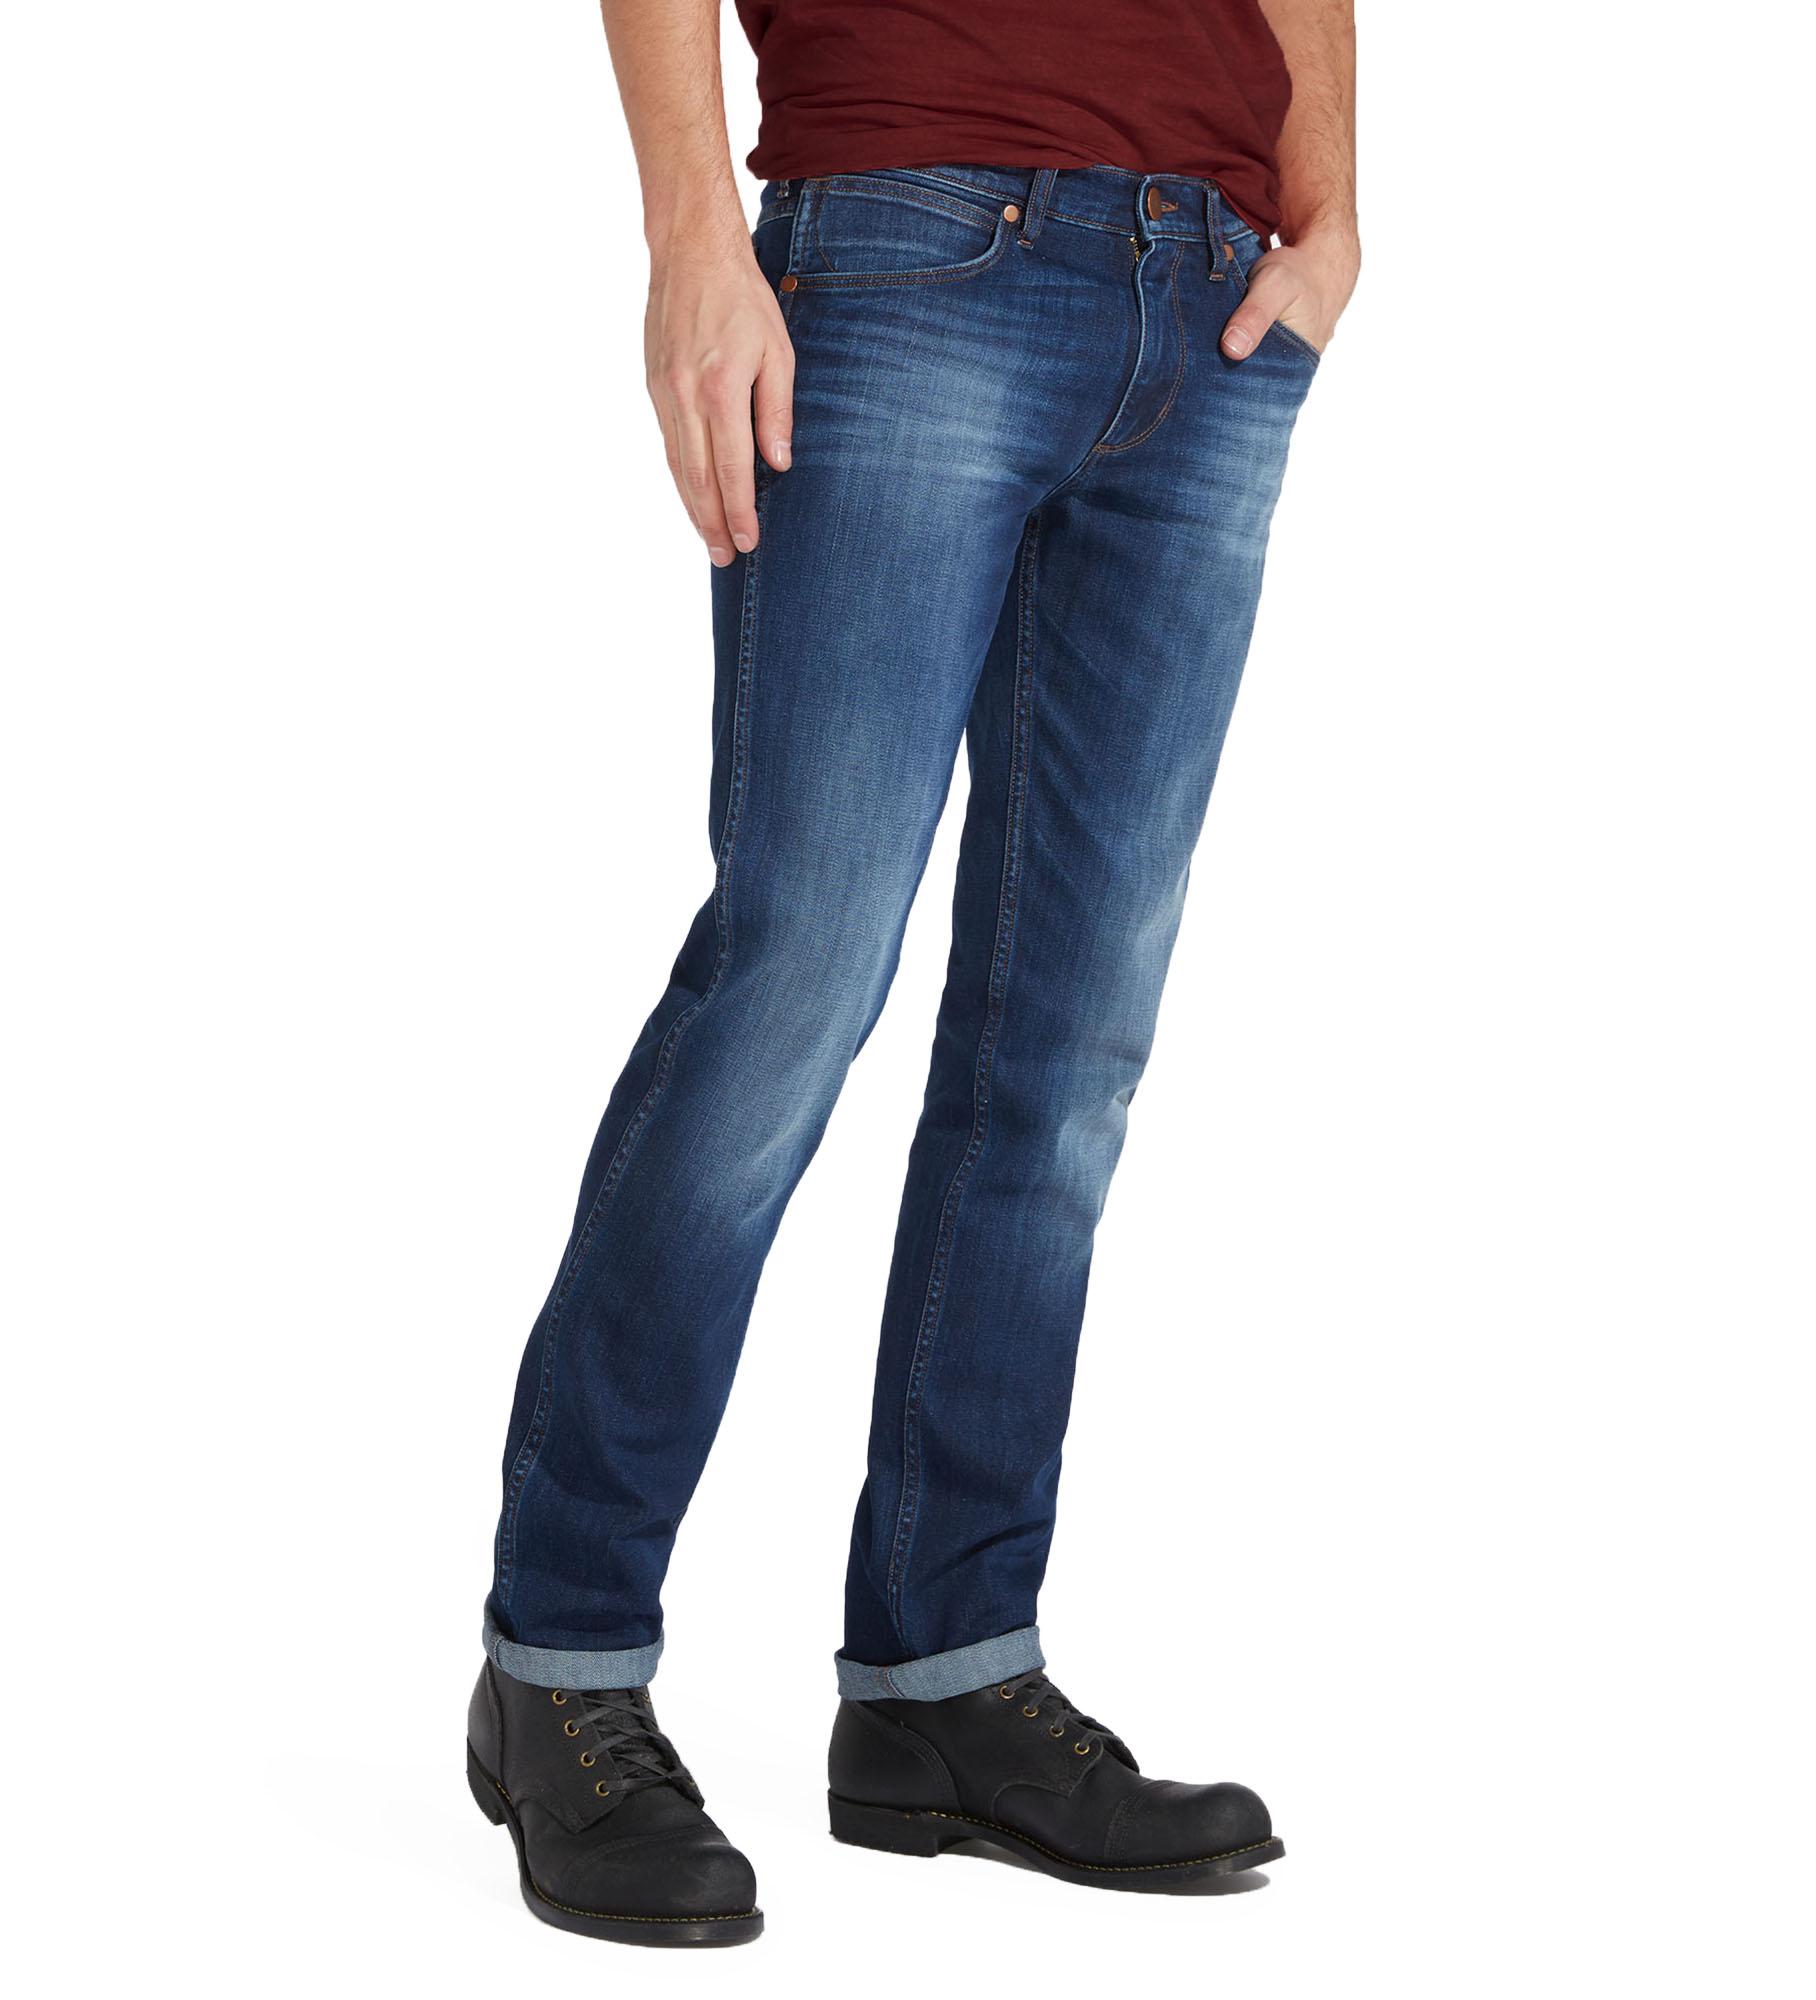 wrangler greensboro regular modern straight tapered stretch jeans blaze denim ebay. Black Bedroom Furniture Sets. Home Design Ideas